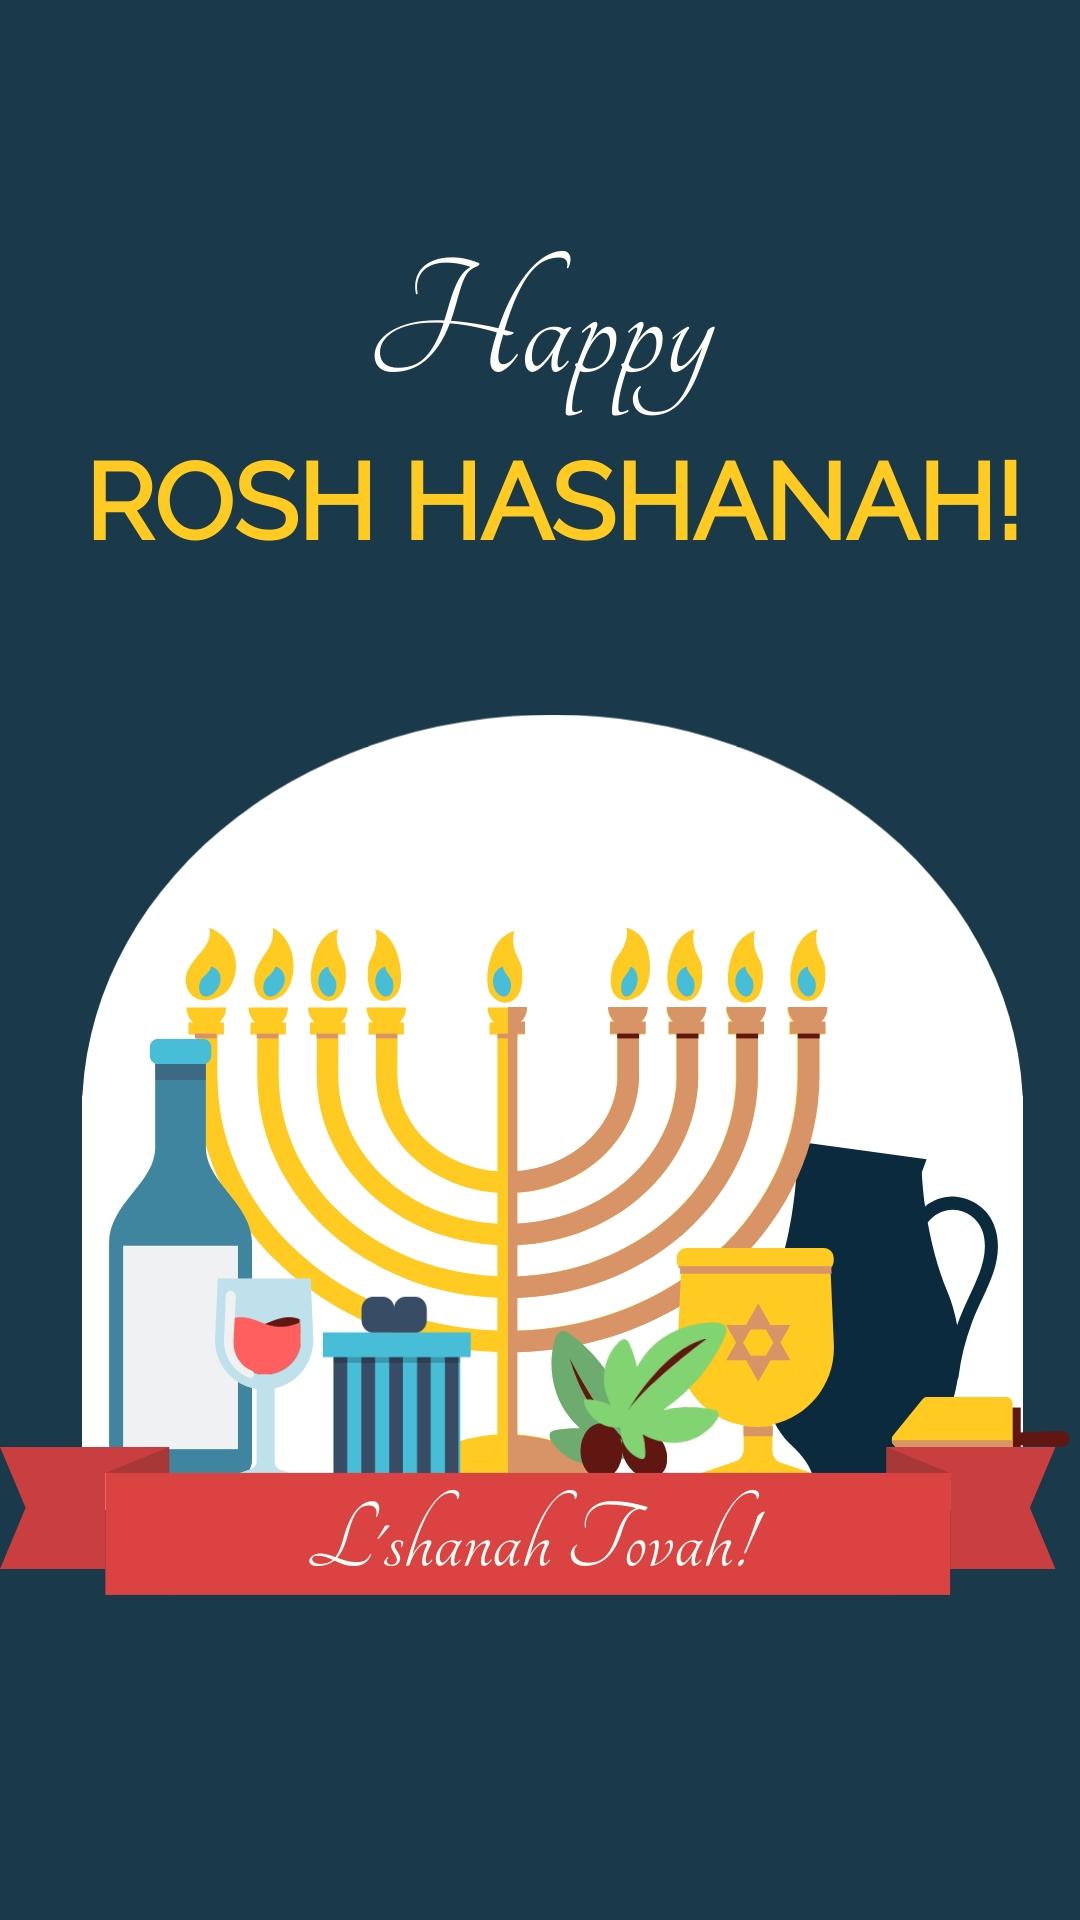 Happy Rosh Hashanah Animated Vertical Template